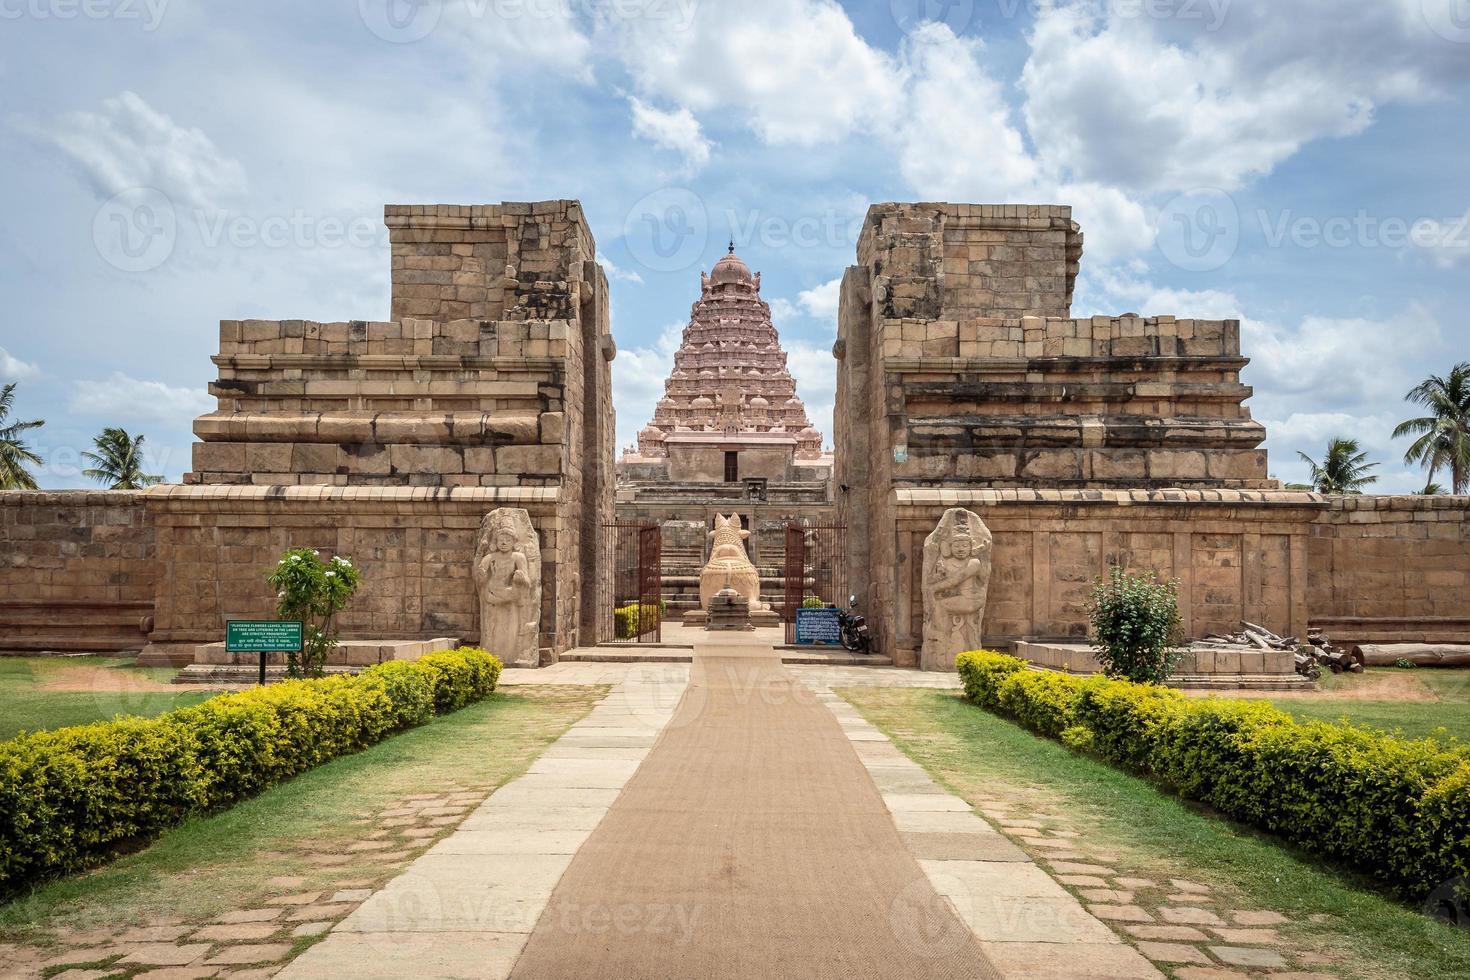 antico tempio indù in india del sud foto